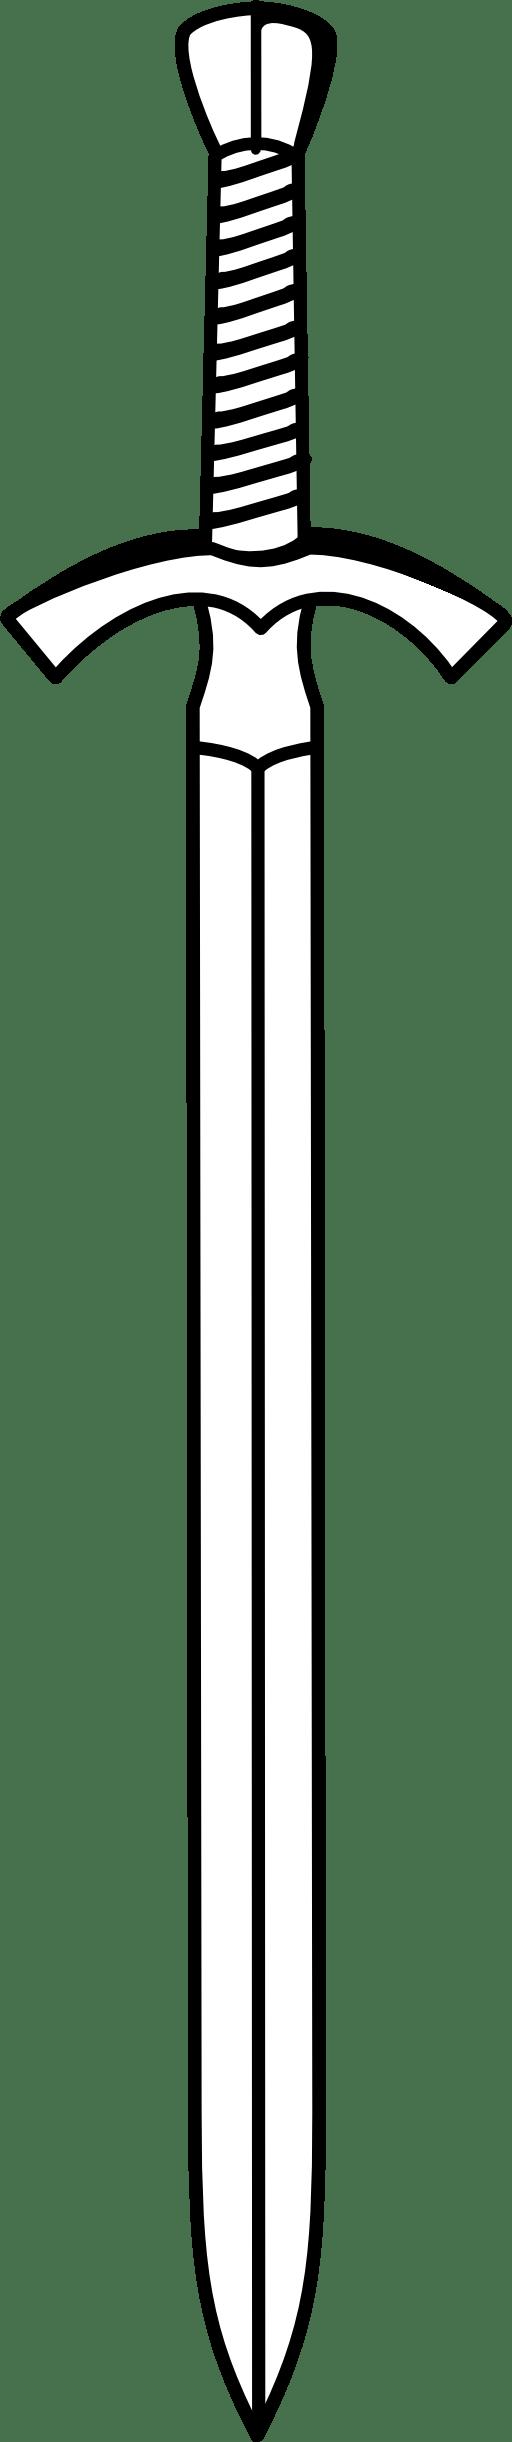 hight resolution of sword